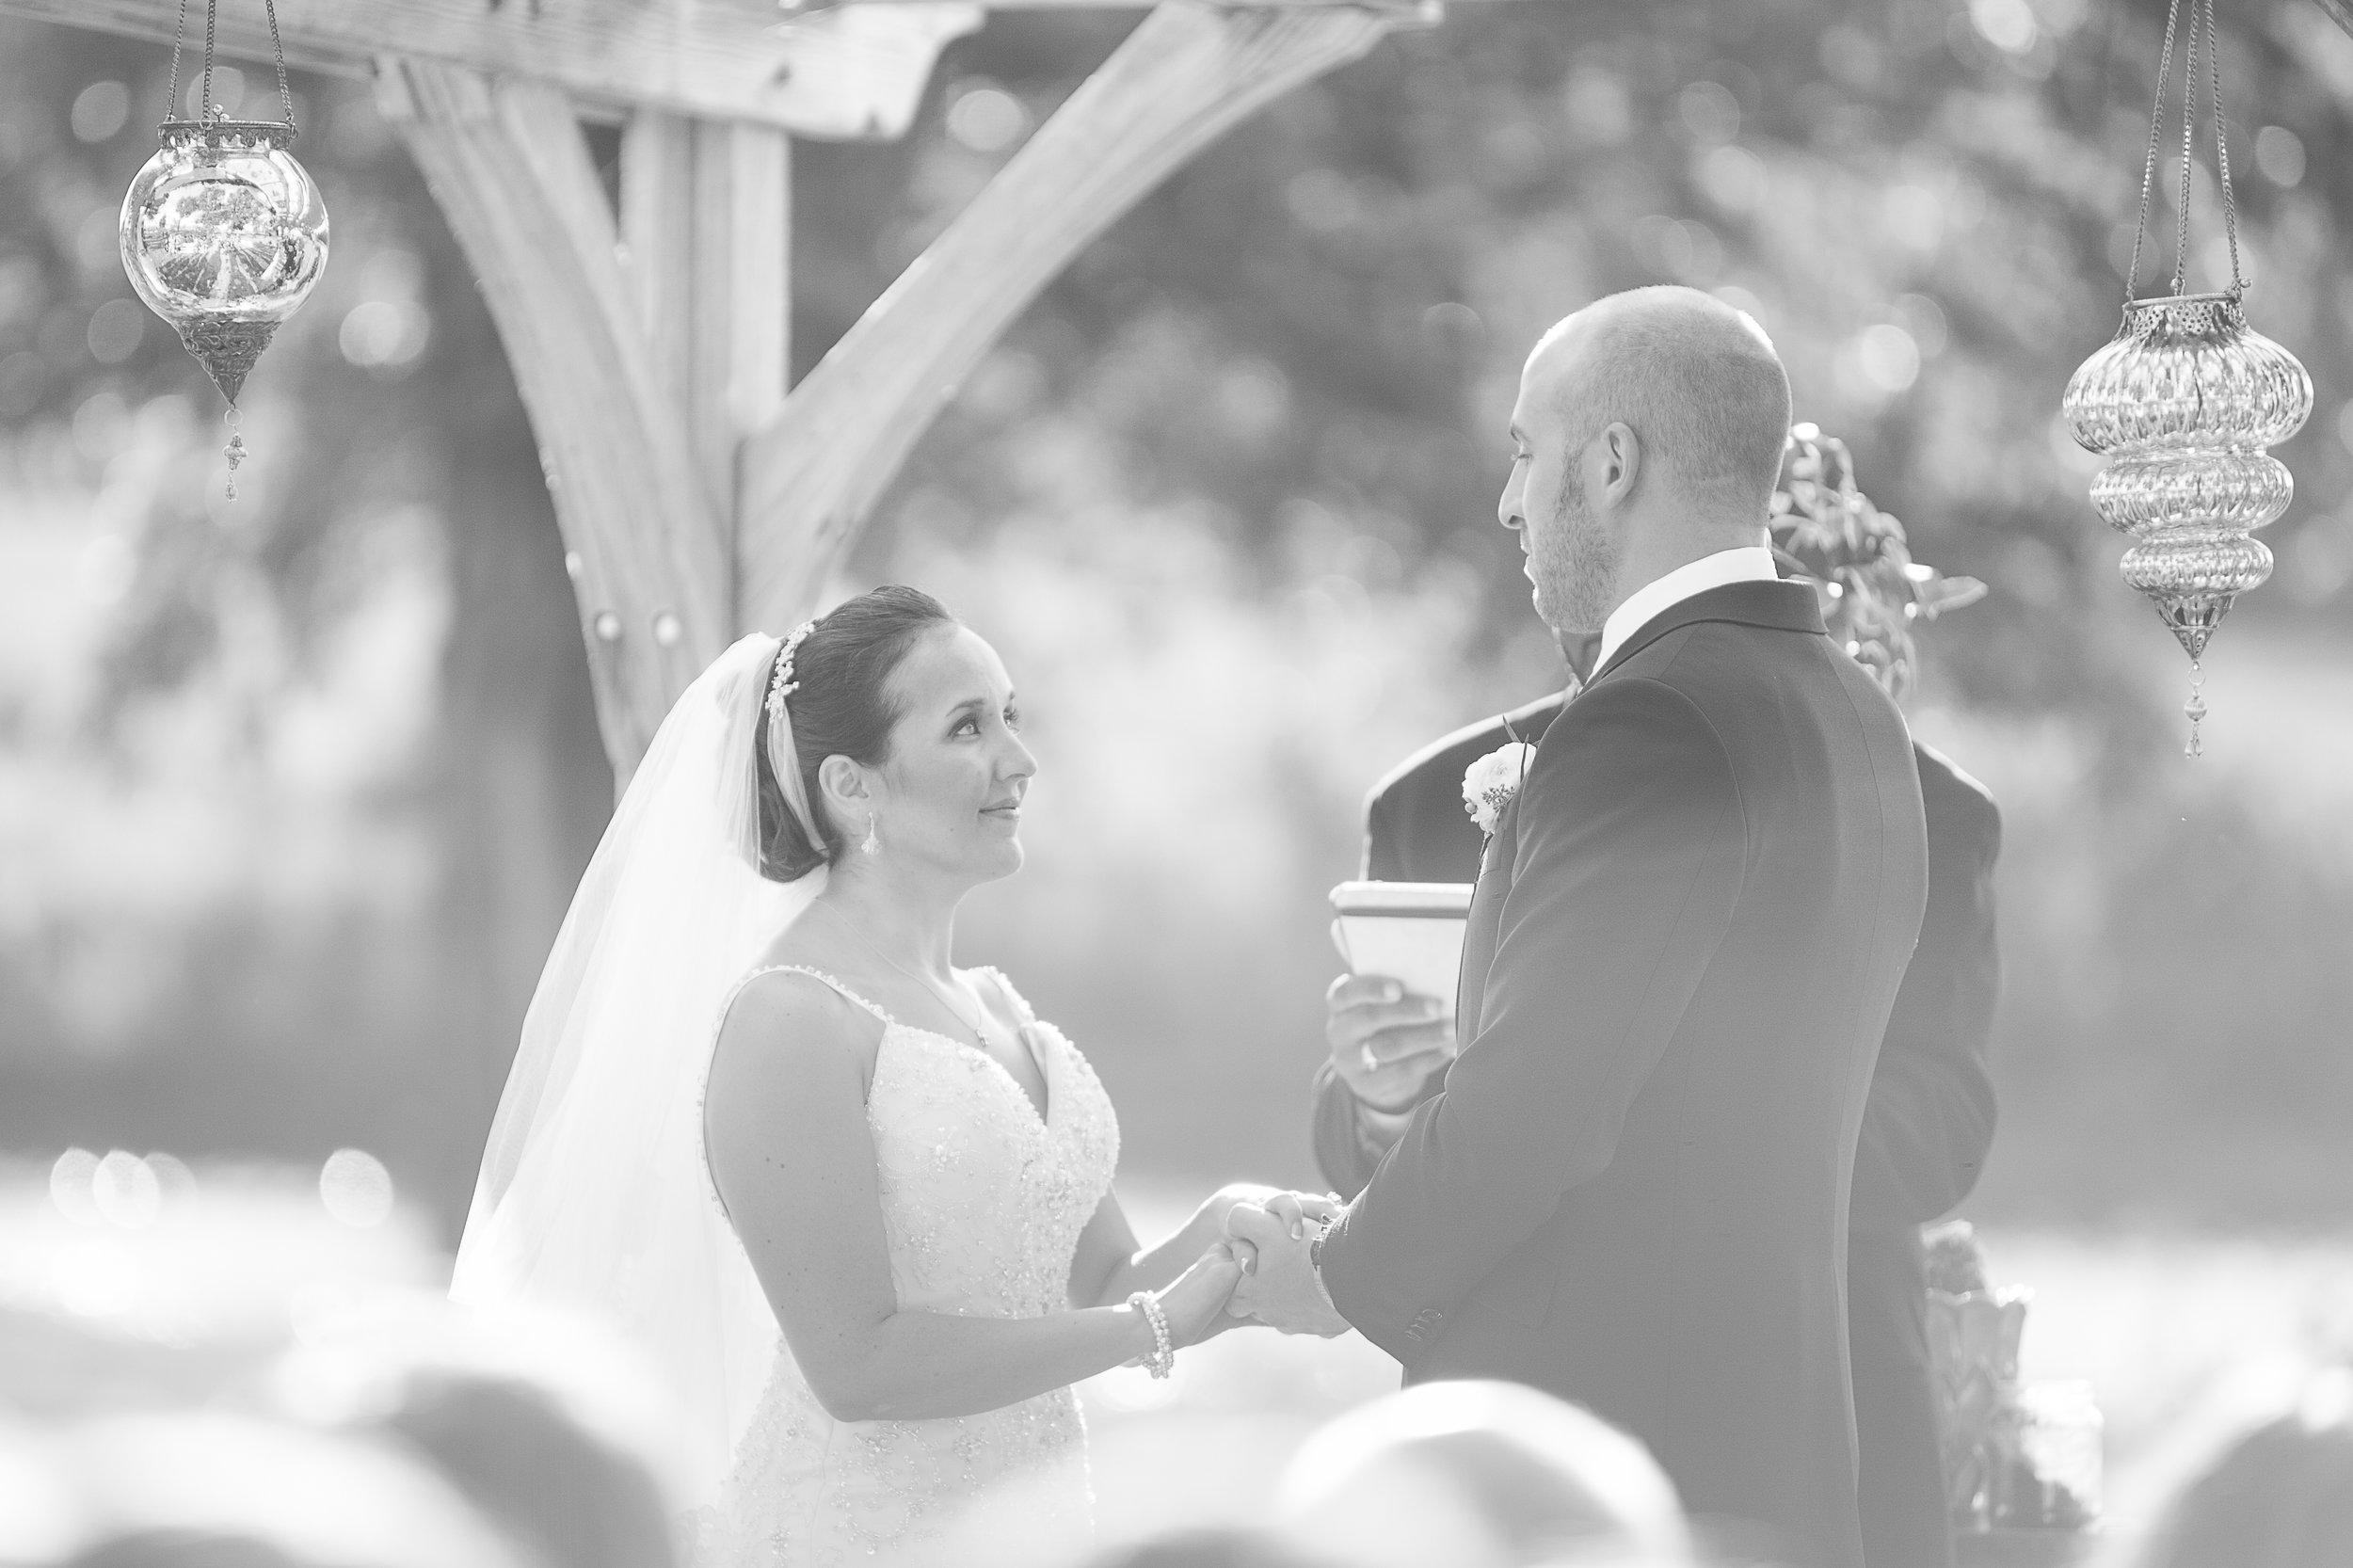 Marissa-Timon-Wedding-Kim-Pham-Clark-Photography-05.jpg